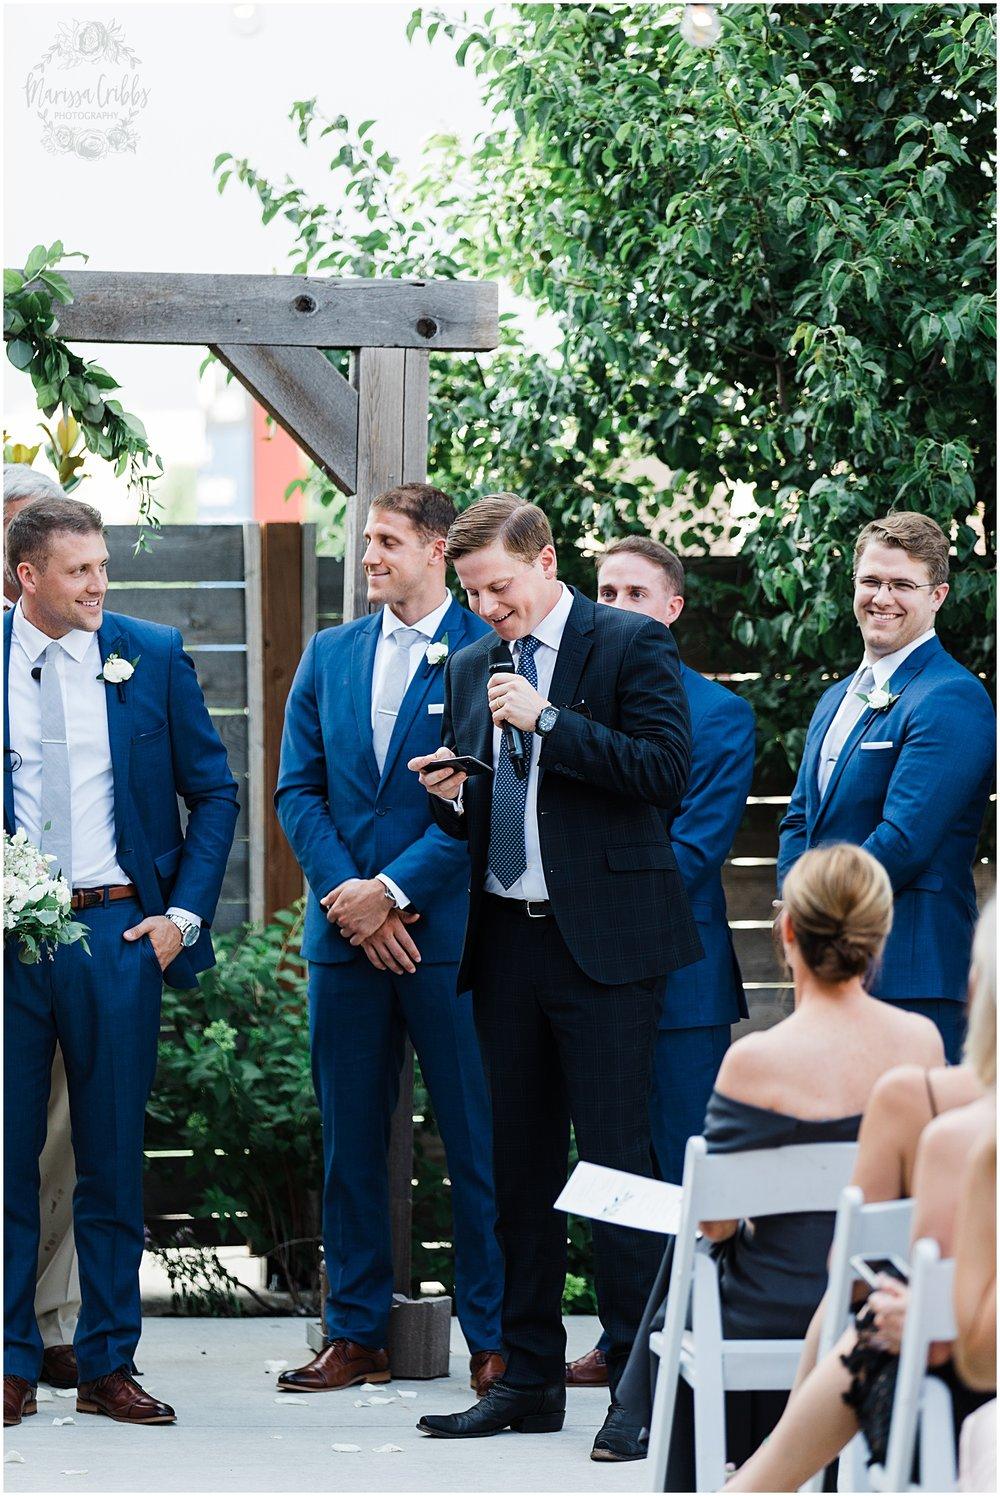 MAGNOLIA VENUE WEDDING | CHARLIE & NATALIE | MARISSA CRIBBS PHOTOGRAPHY_5758.jpg